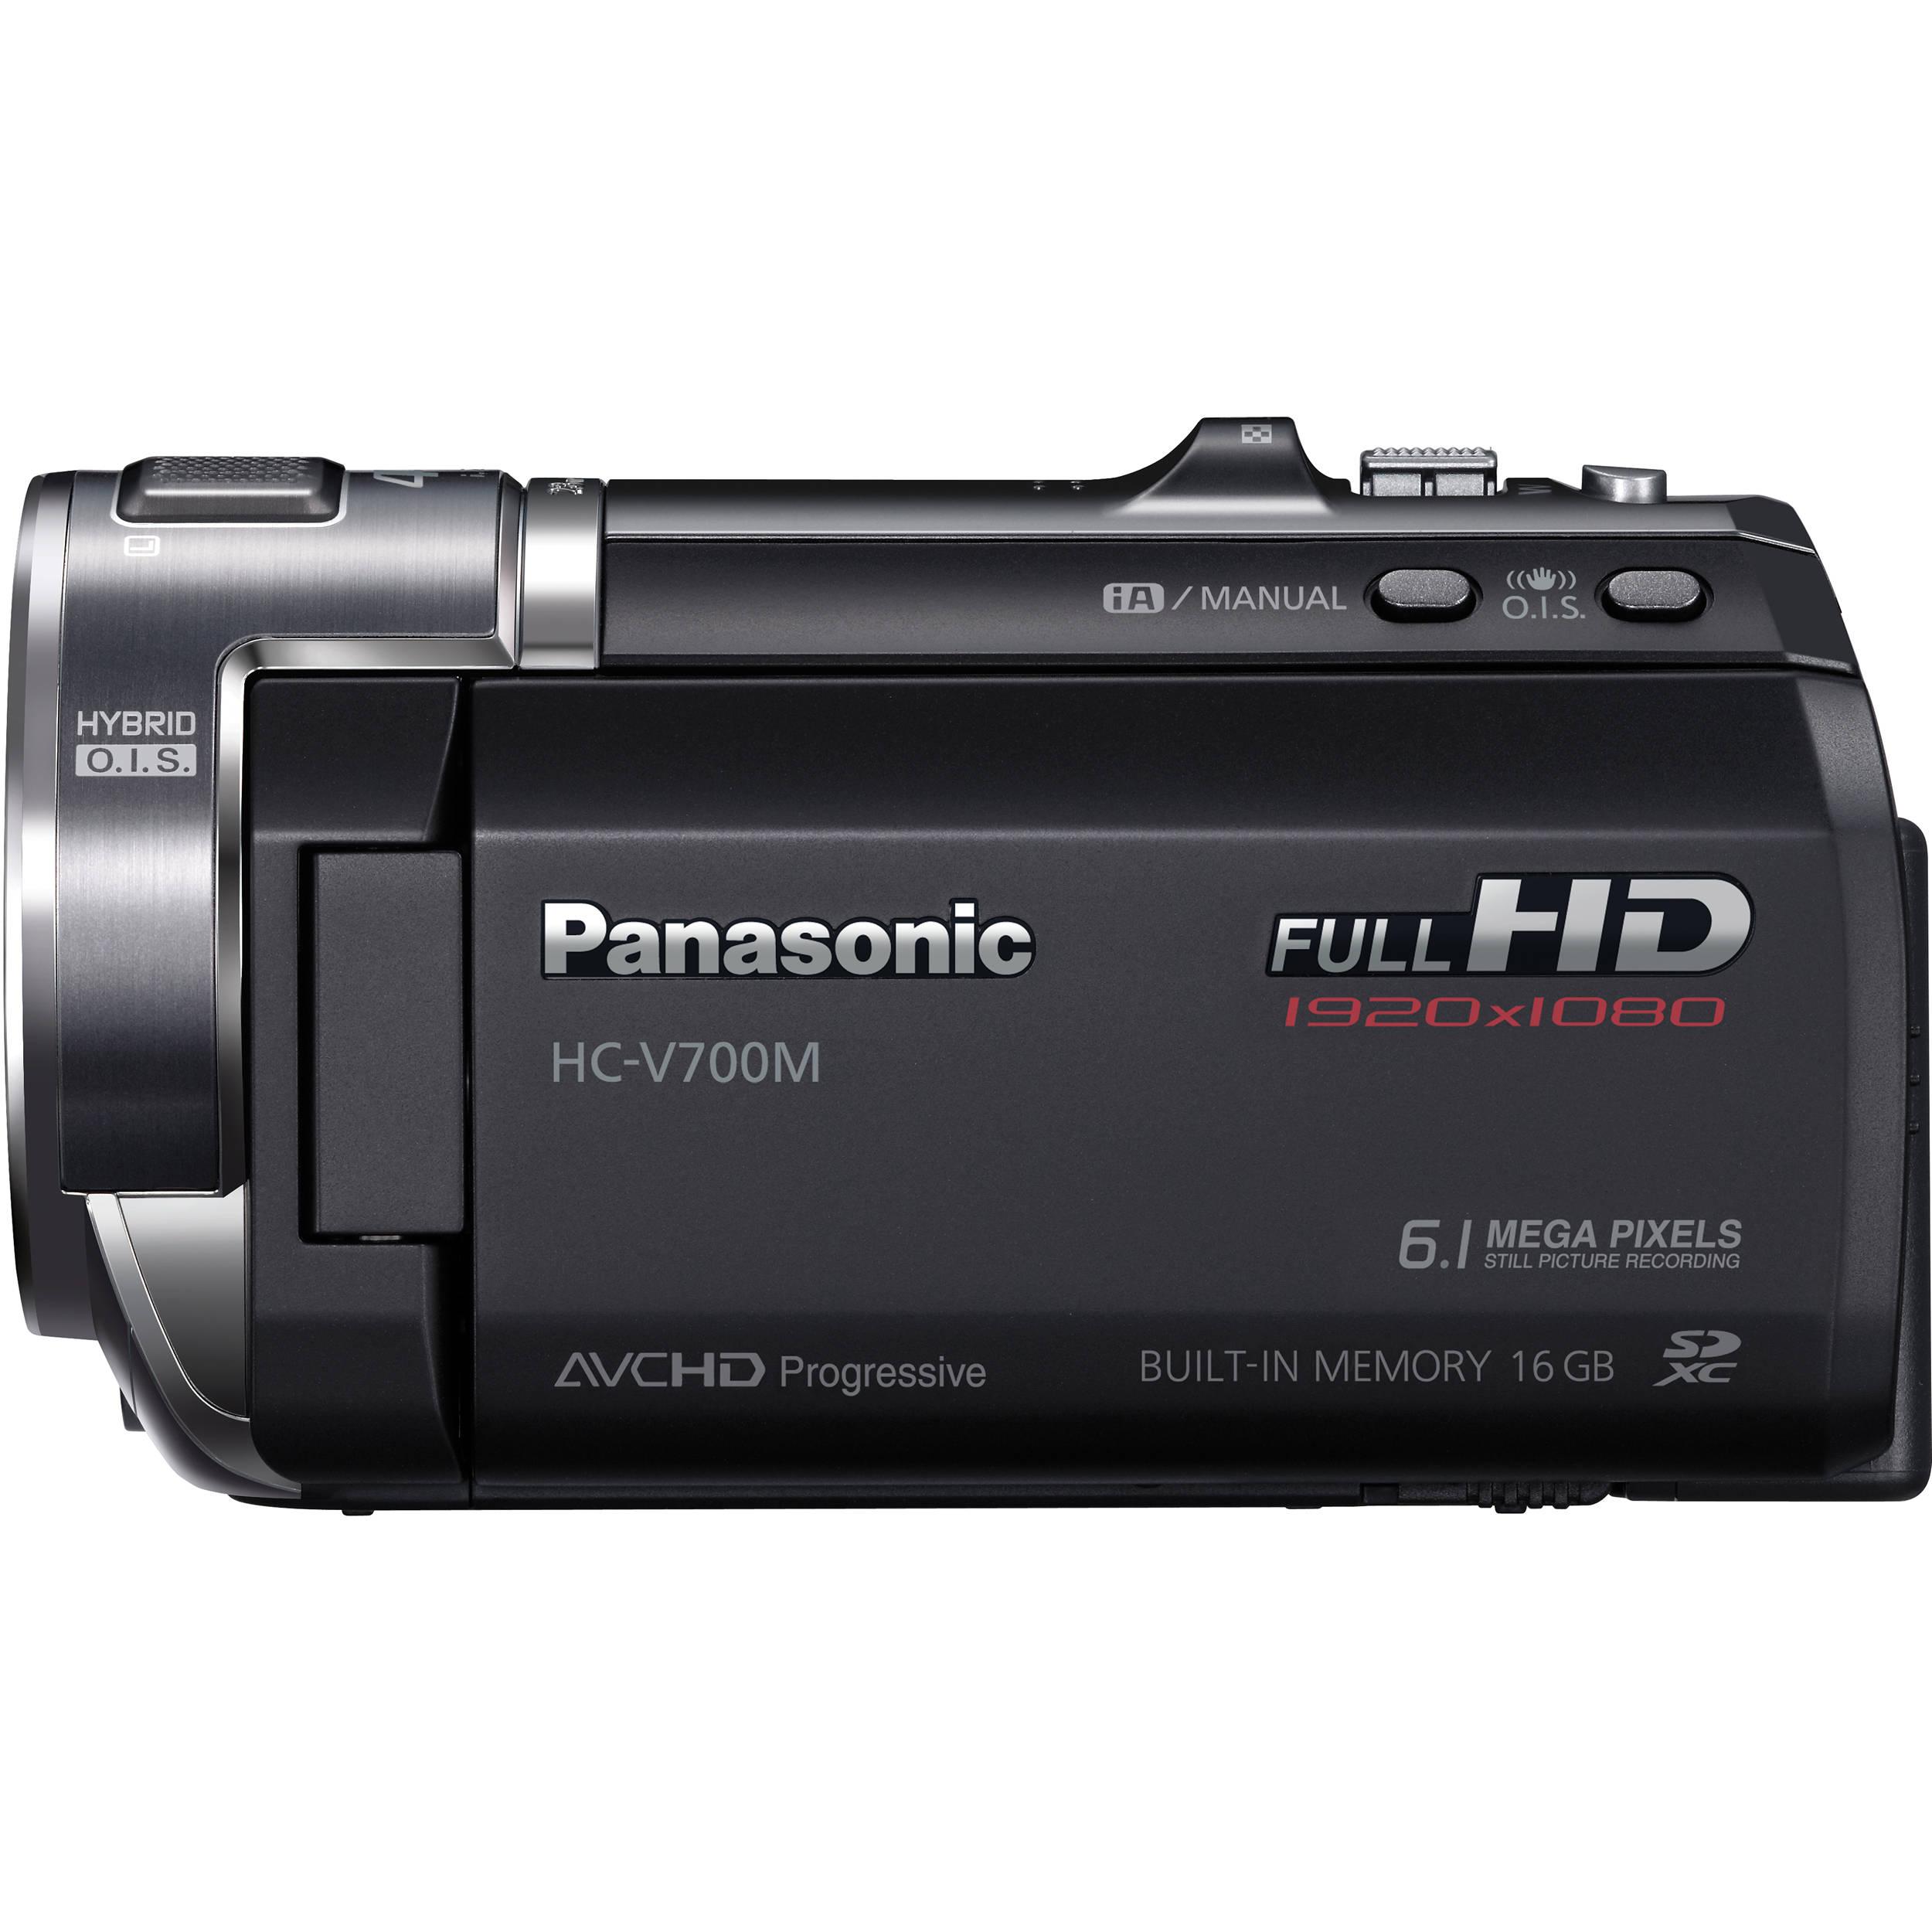 Panasonic V700M Camcorder Memory Card 2 x 16GB Secure Digital High Capacity 2 Pack Memory Cards SDHC